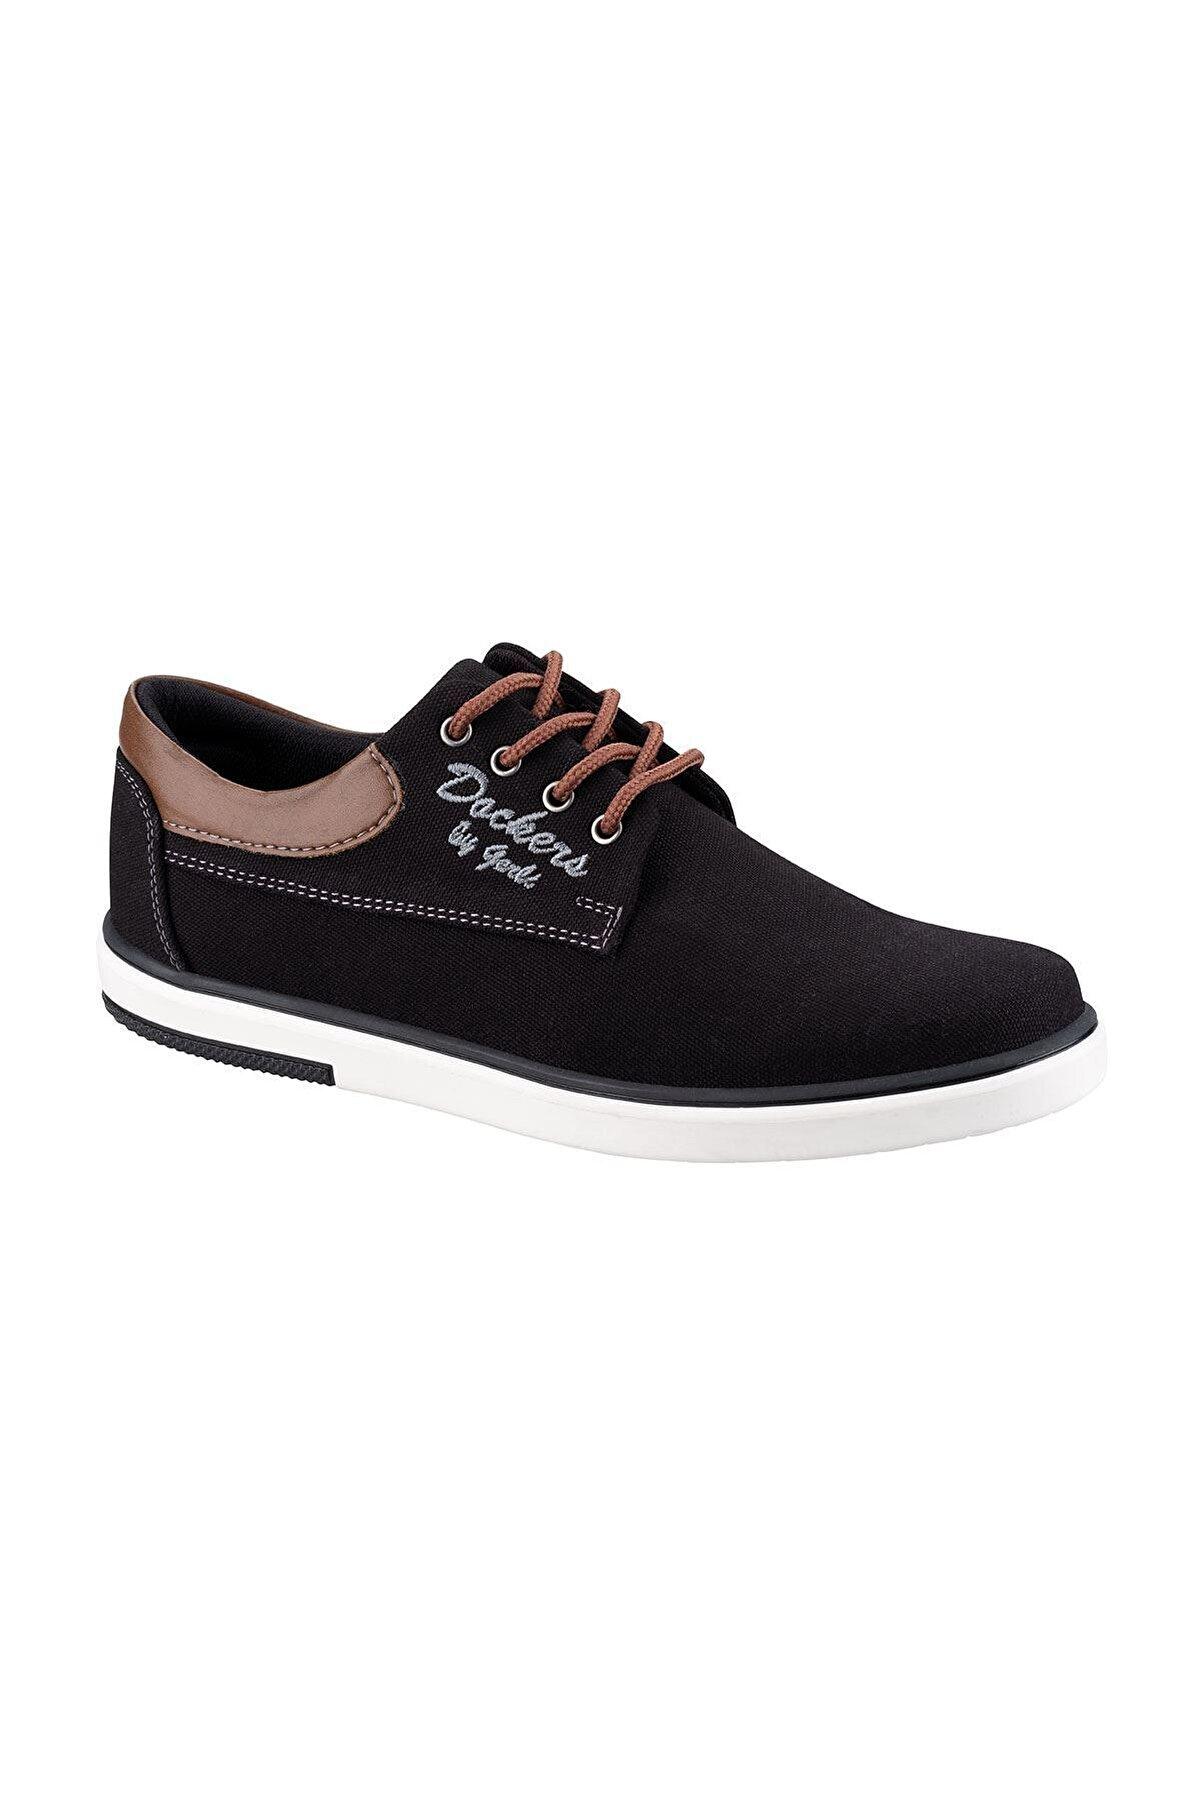 Dockers 224942 1FX Siyah Erkek Sneaker Ayakkabı 100781236